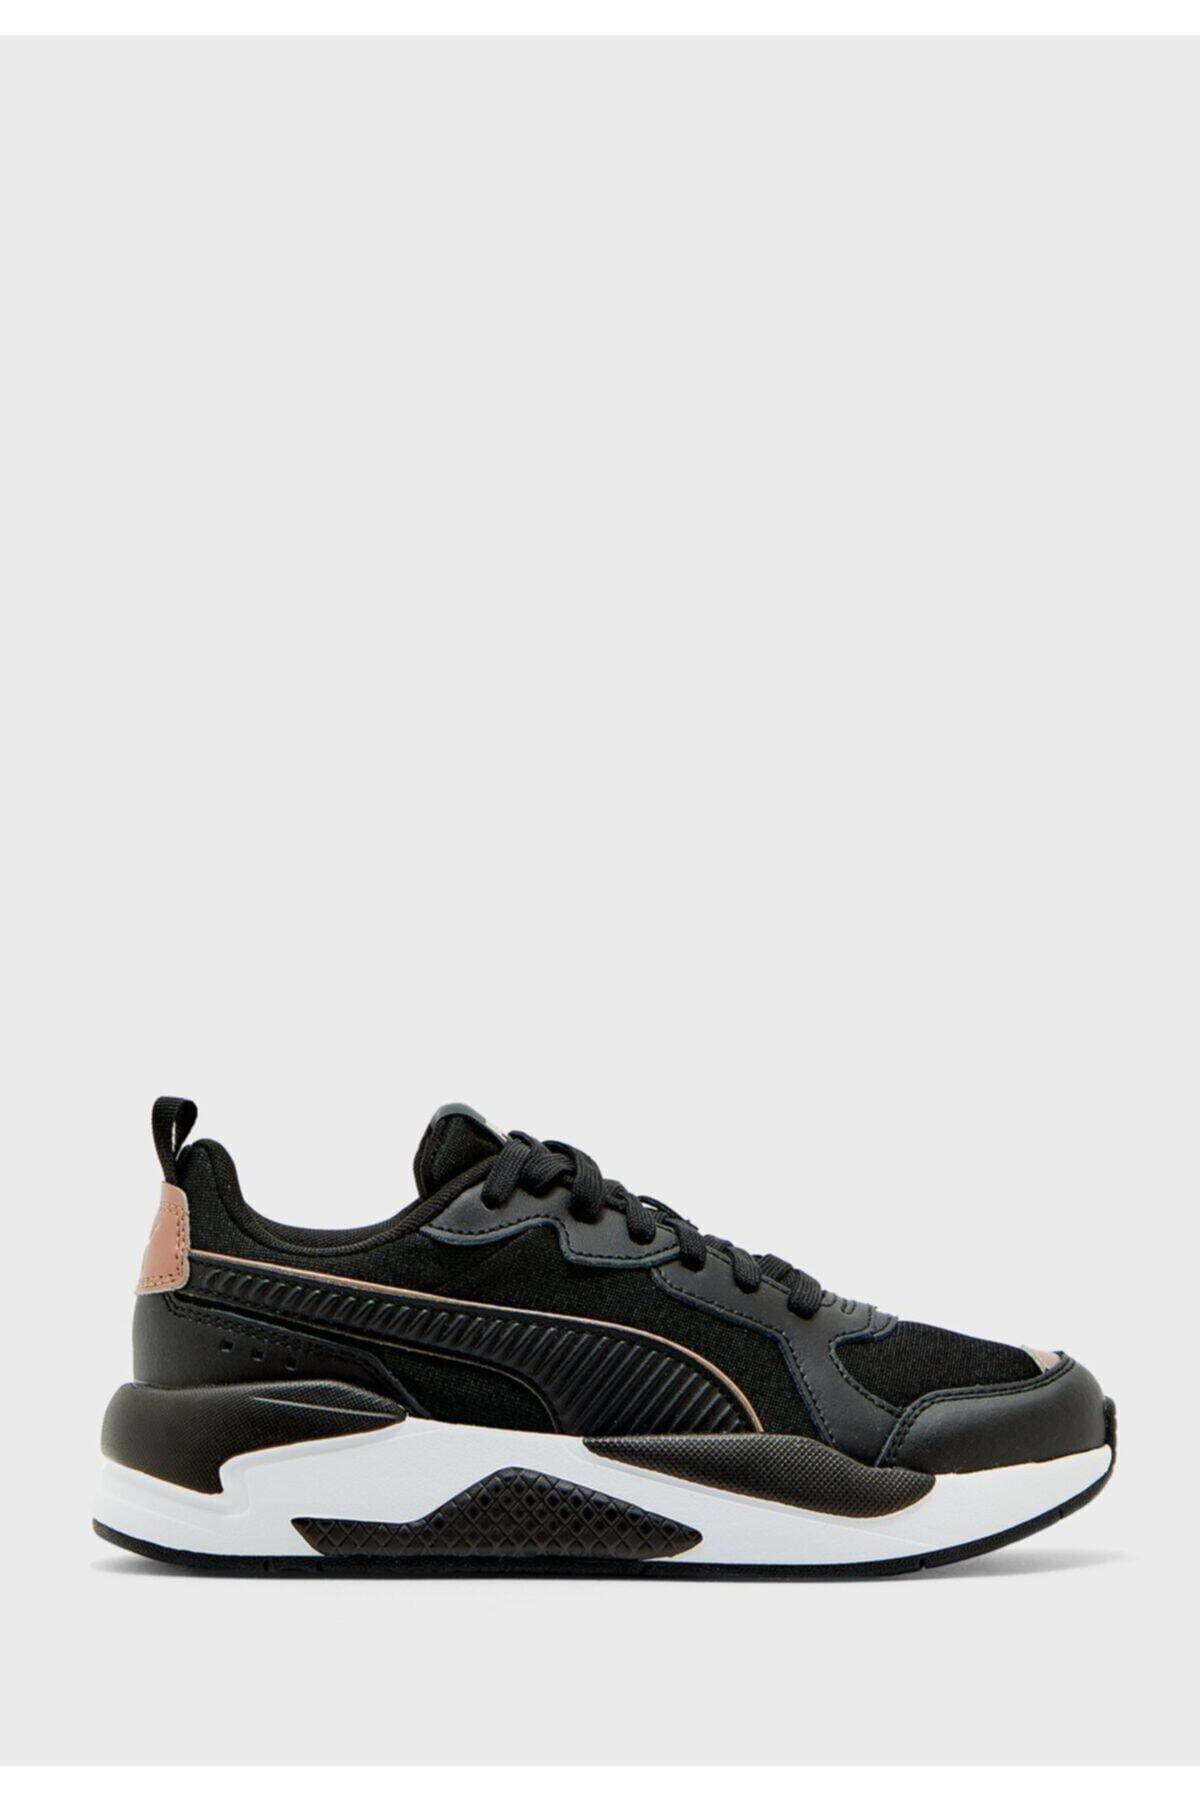 Puma X-RAY METALLIC WN S PUMA Siyah Kadın Sneaker Ayakkabı 101085468 1